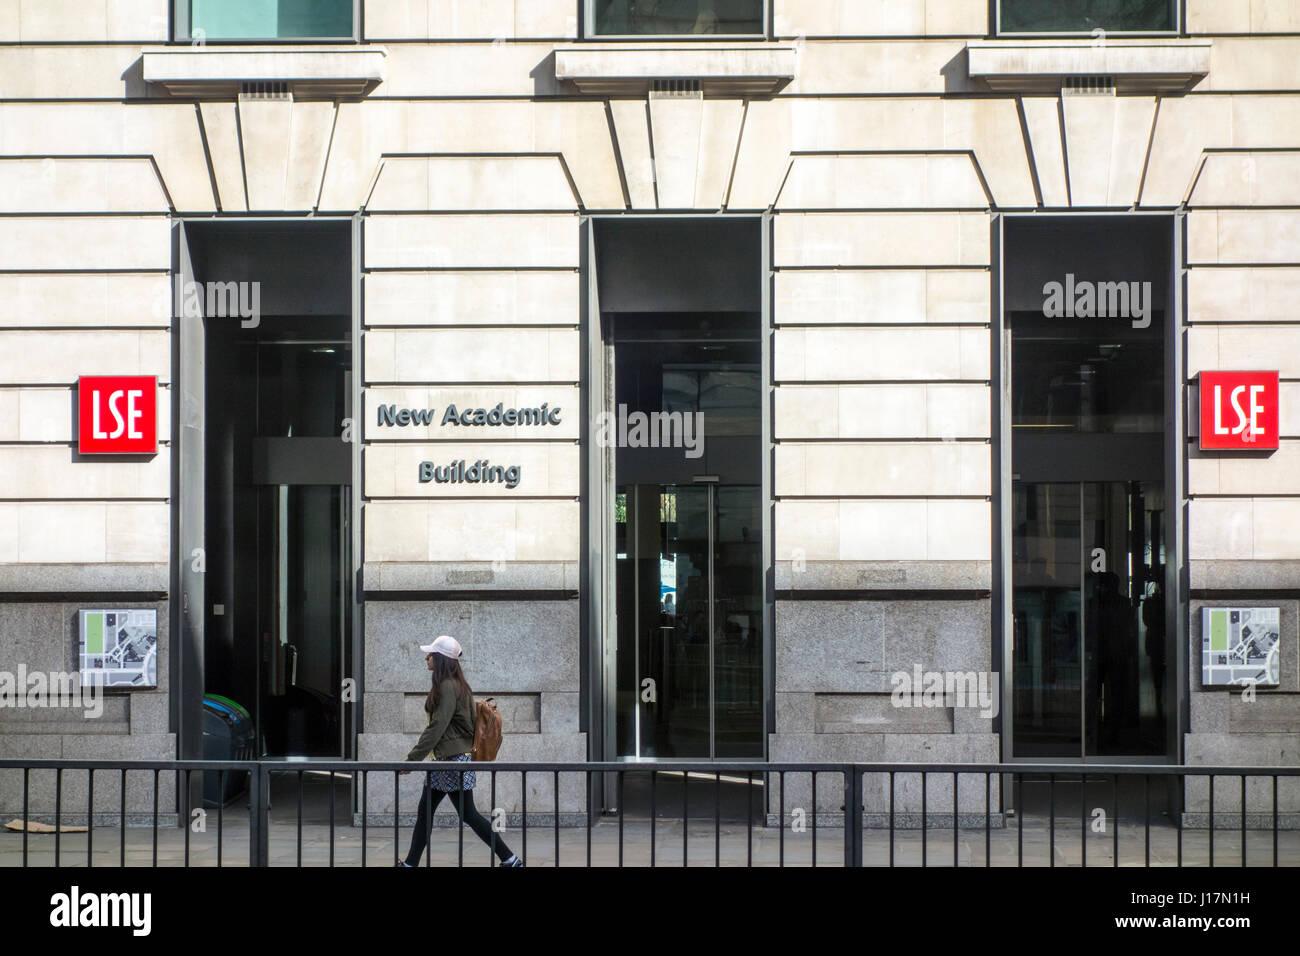 London School of Economics, LSE, New Academic Building, Kingsway, London, UK - Stock Image